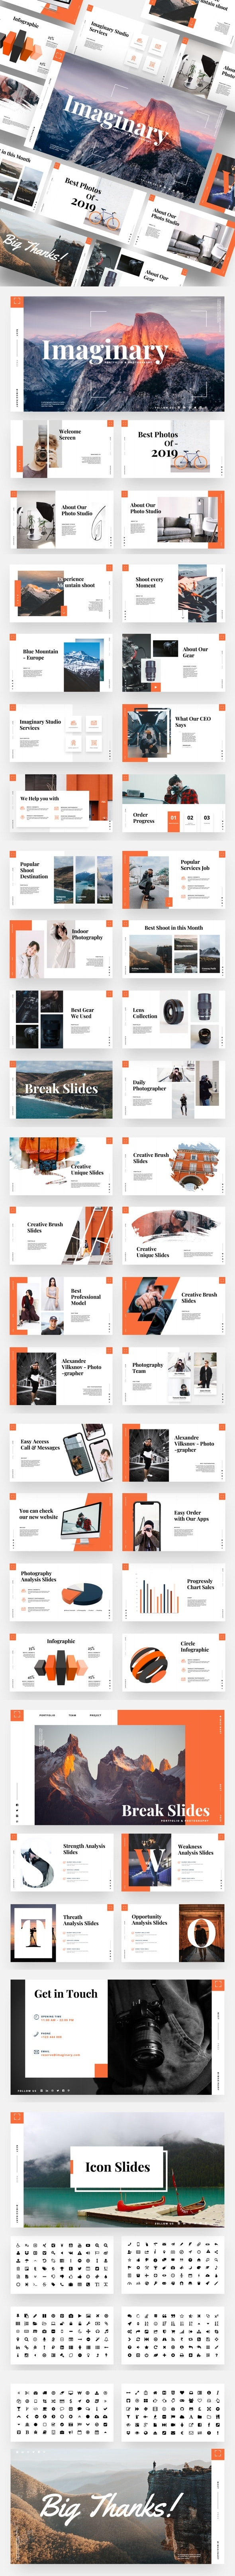 Imaginary - Portfolio & Photography Keynote Template - Business Keynote Templates